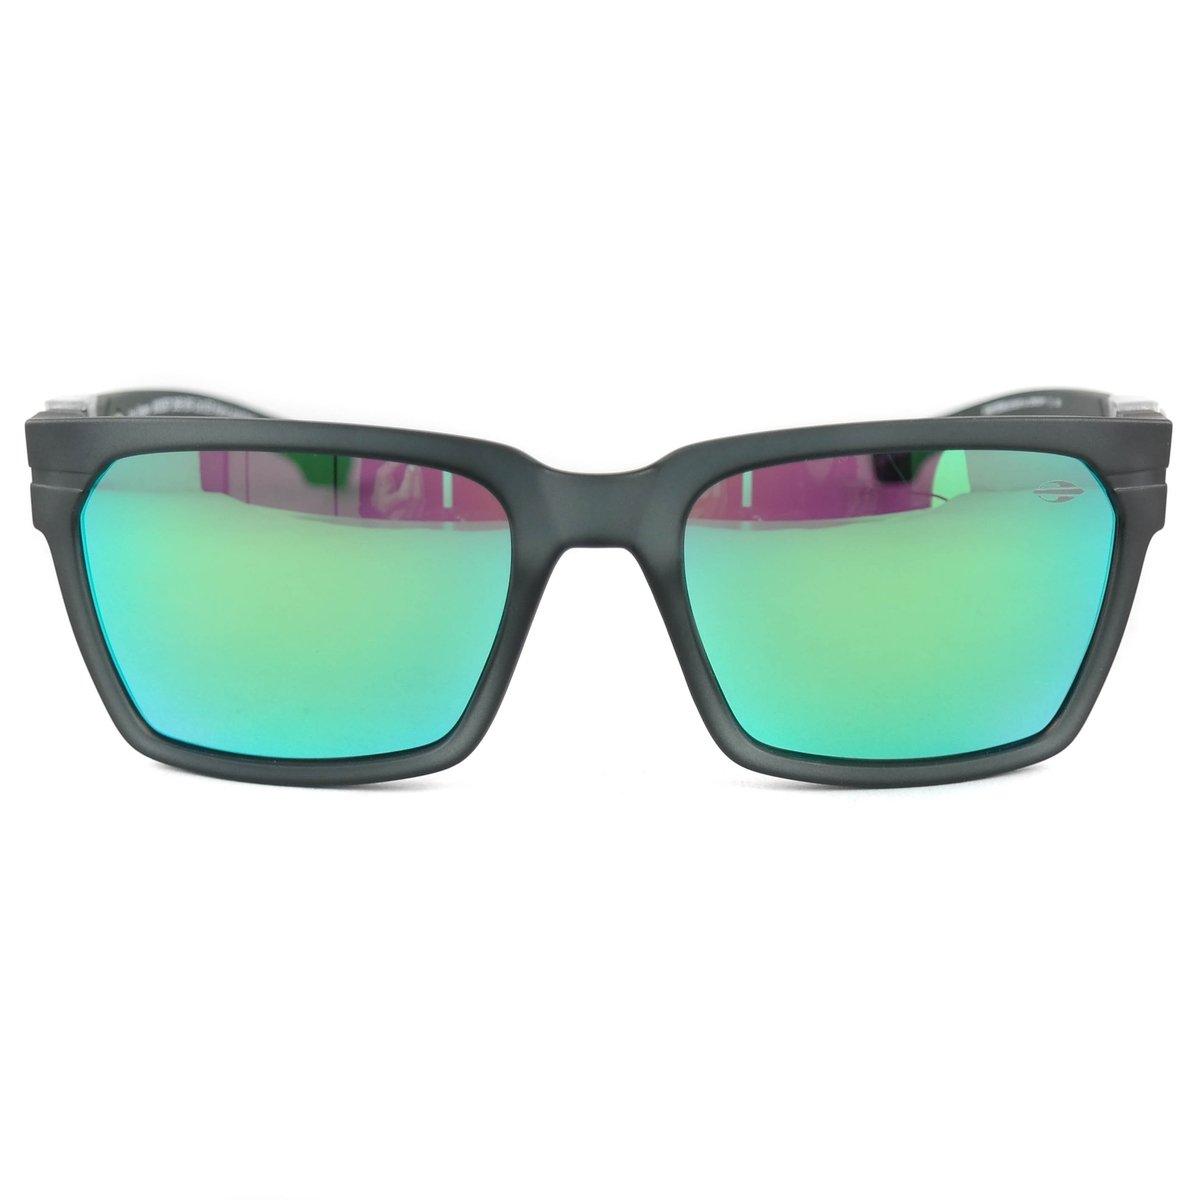 23738430d372d Óculos de Sol Mormaii Las Vegas - Cinza e Verde - Compre Agora   Zattini